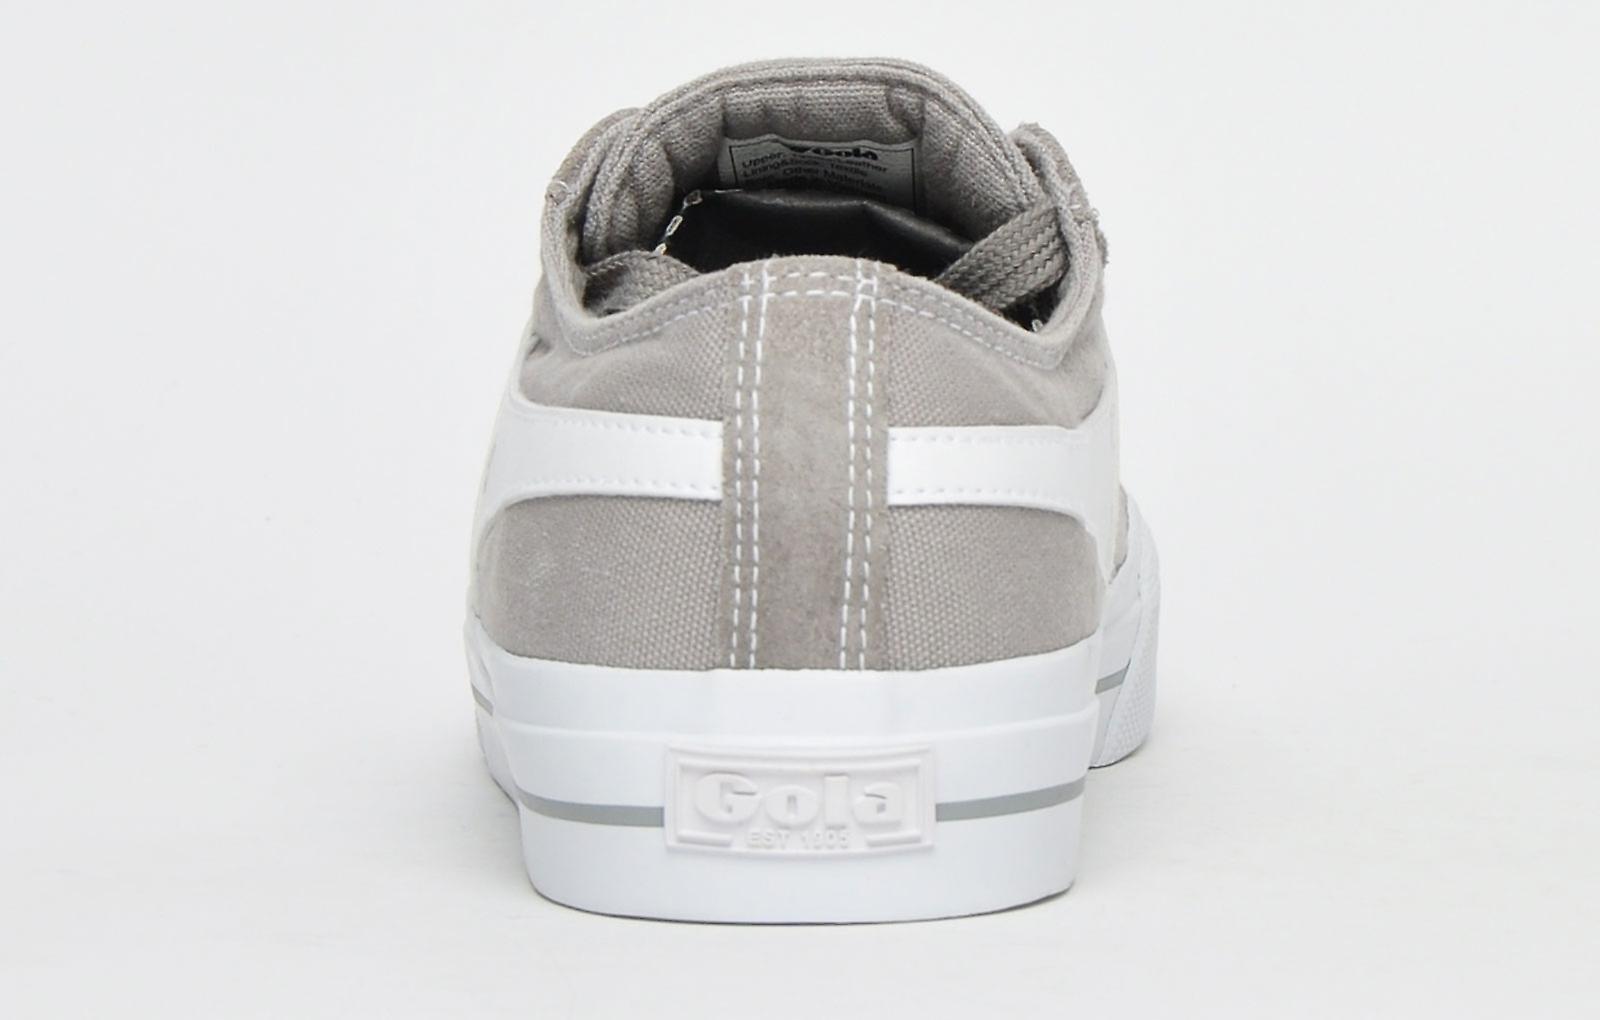 Gola Classics Quota II Light Grey / White